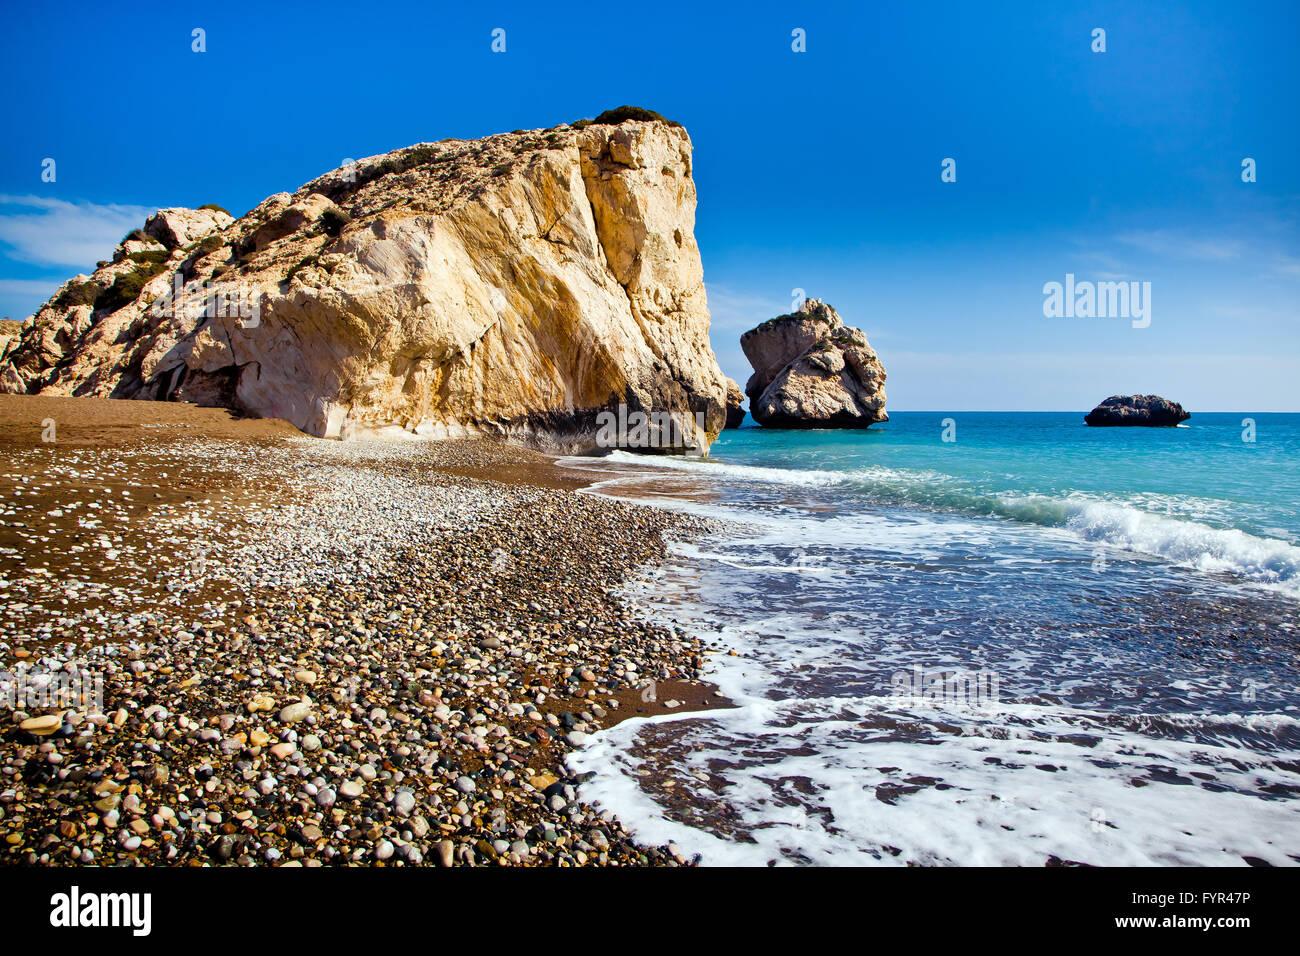 Aphrodites legendäre Geburtsort in Paphos, Zypern Stockbild